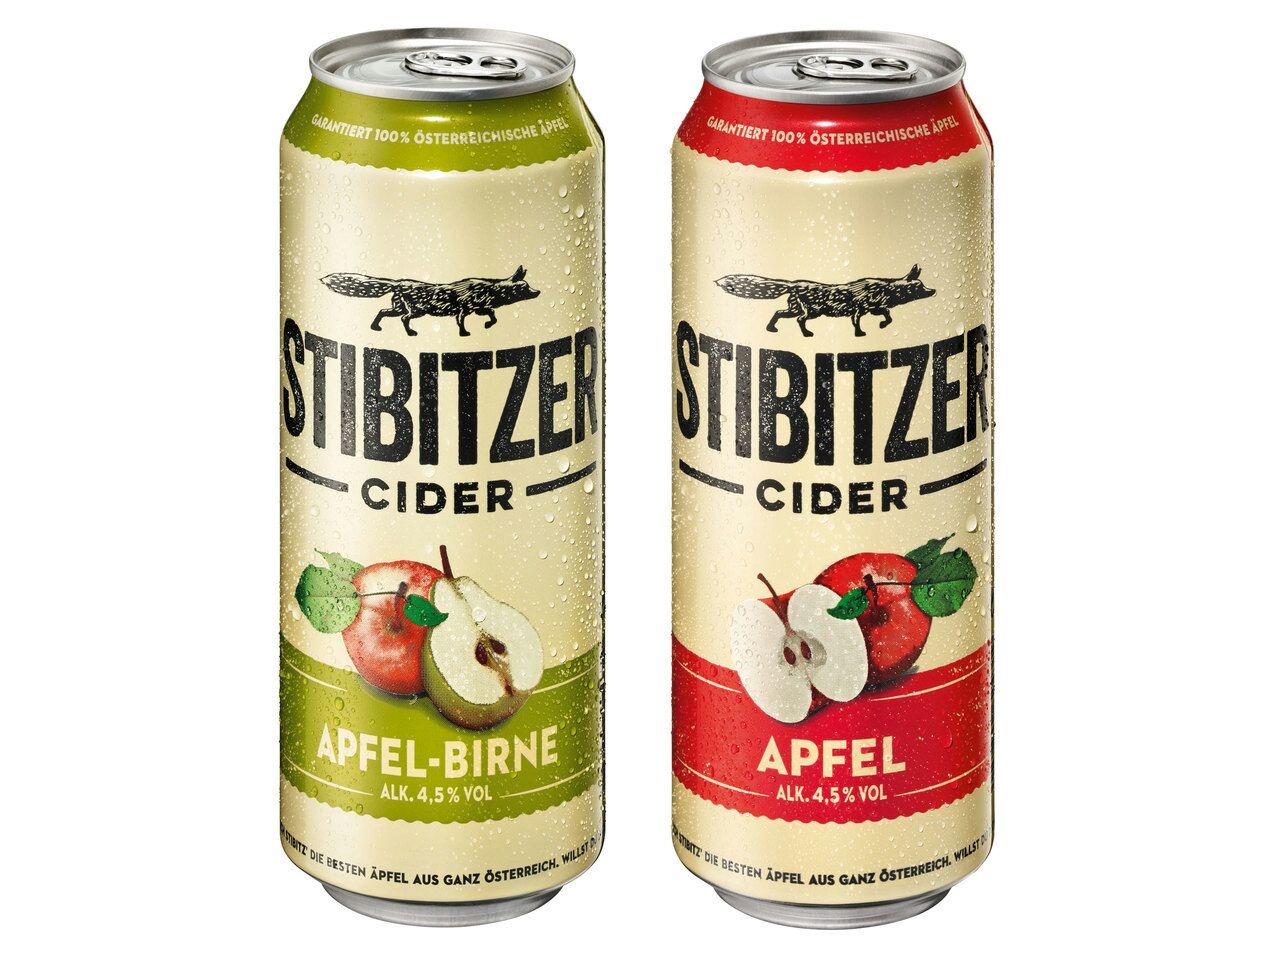 [Lidl] Stibitzer 0,5L Dose Apfel oder Apfel/Birne Cider für 0,95 € - ab Donnerstag